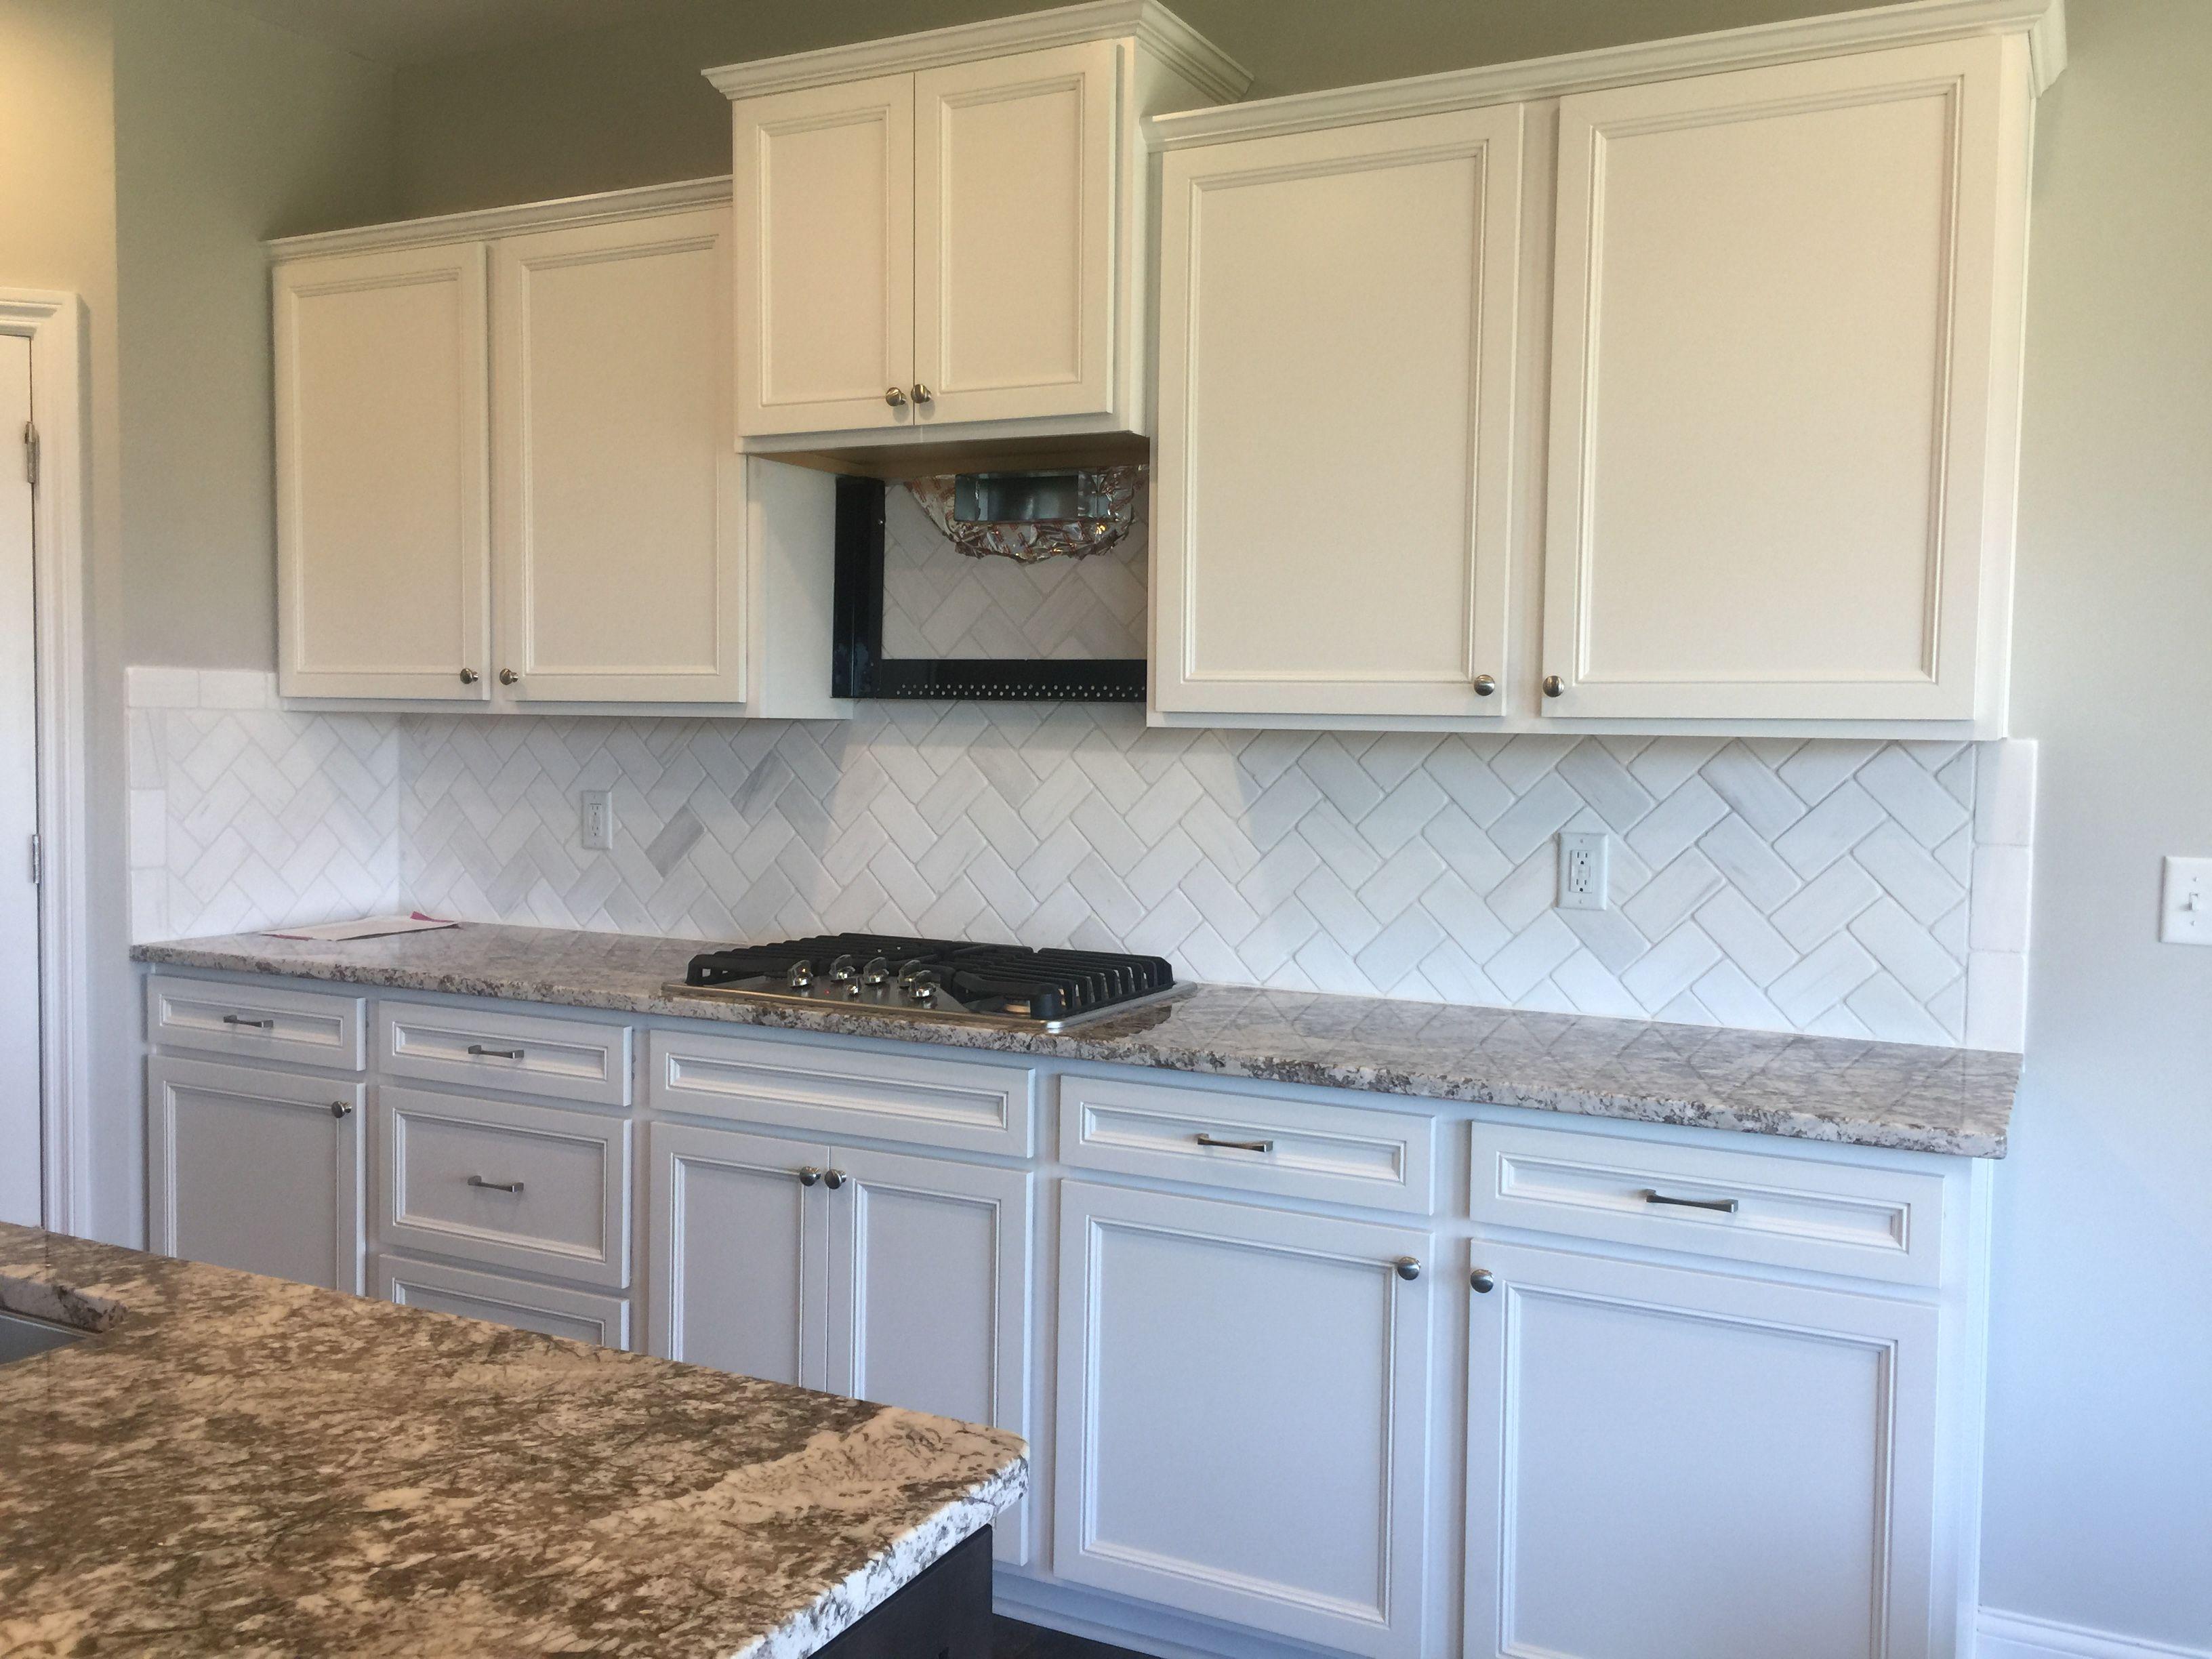 Landen Painted White 5 Pc Drawer Front Cabinet Kitchen Themes New Homes Kitchen Backsplash